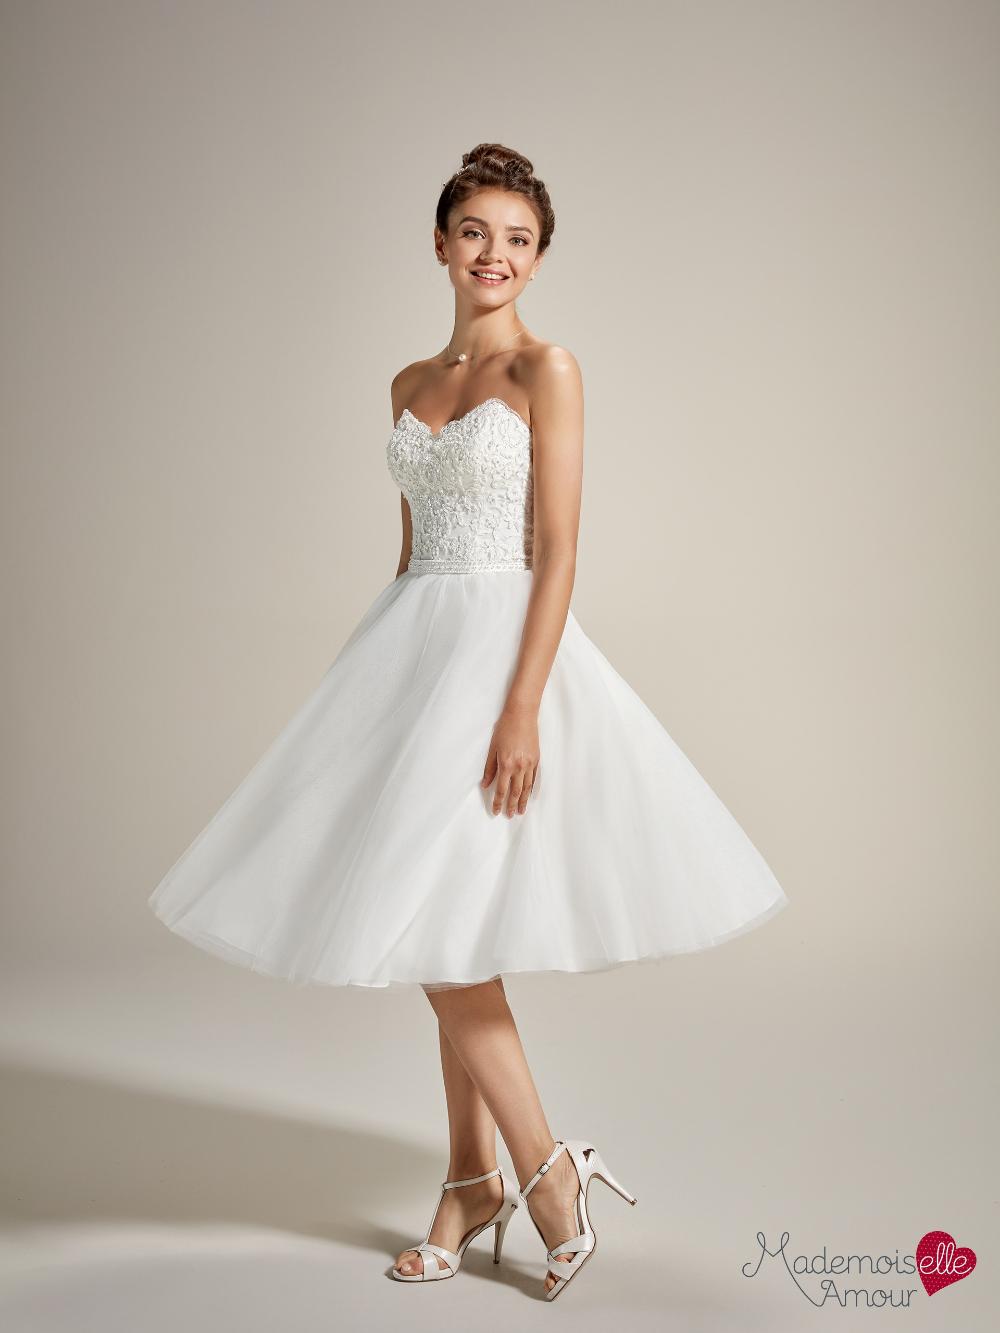 Mademoiselle Naia - robe de mariée courte